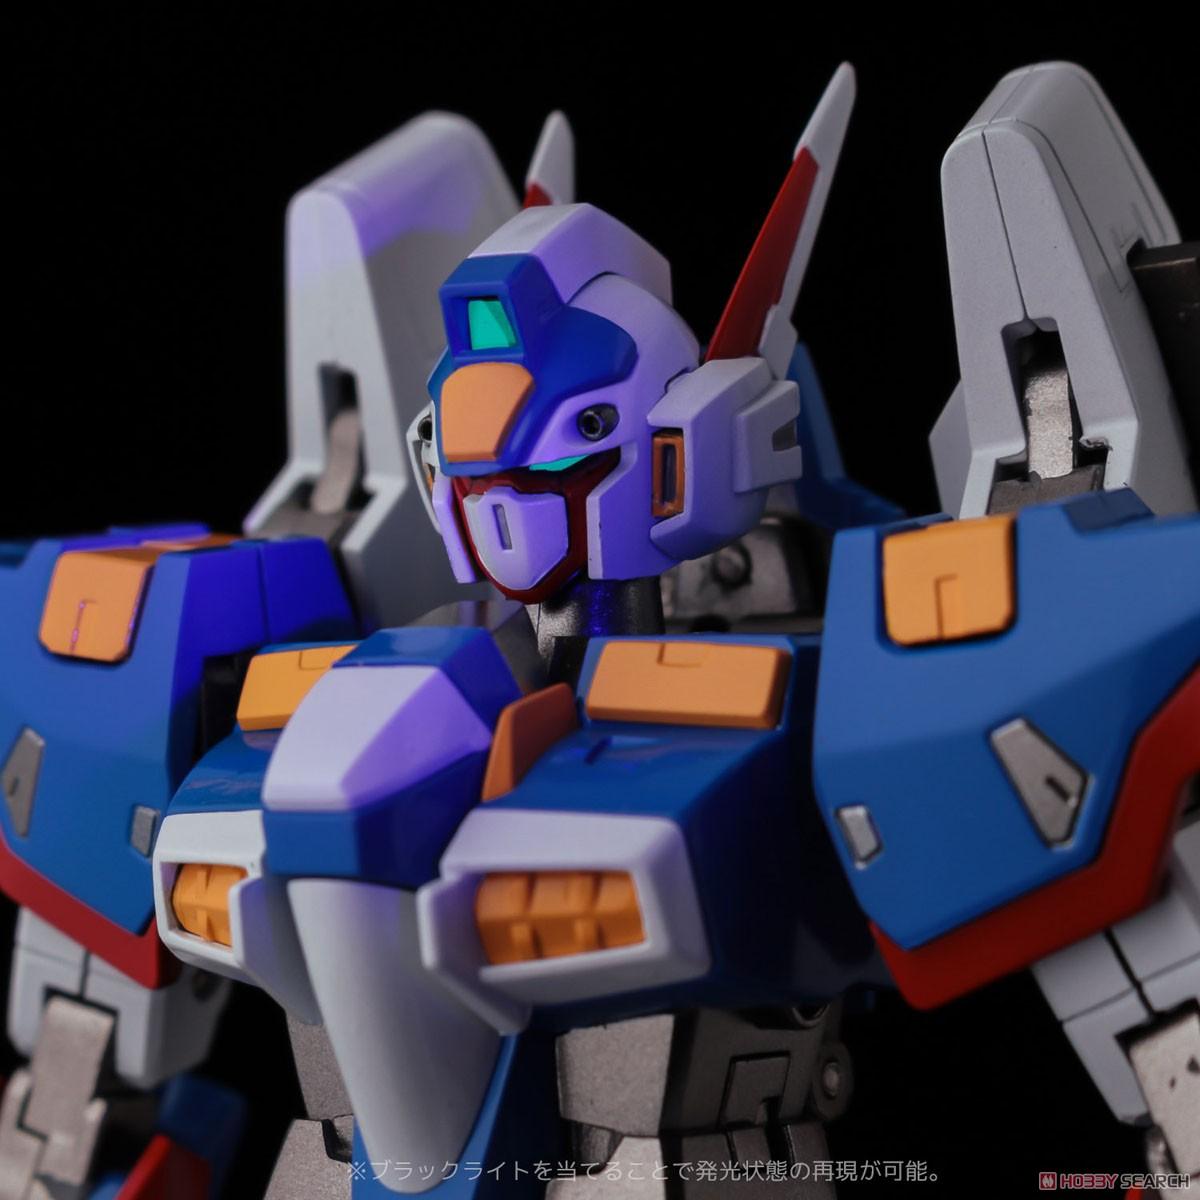 RIOBOT『変形合体 R-1』スーパーロボット大戦OG 可変合体フィギュア-011